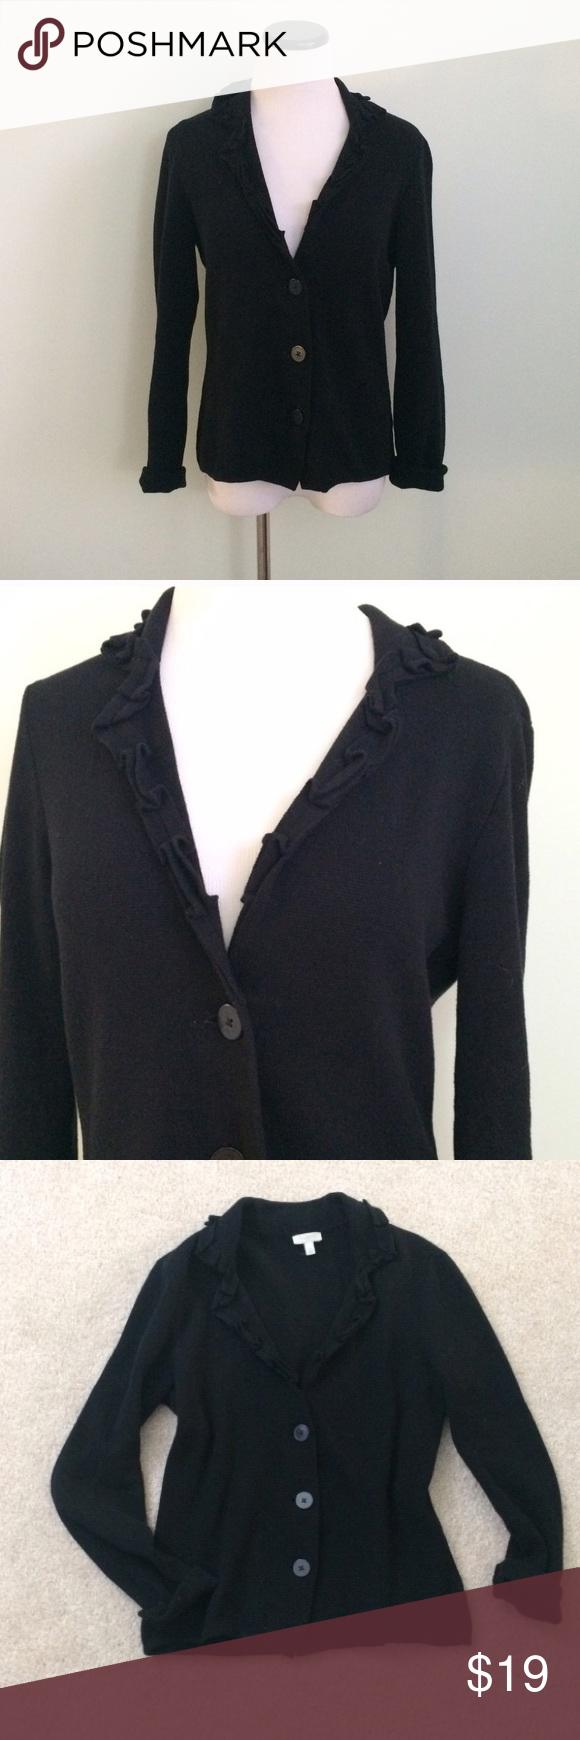 TALBOTS Black ruffle Cardigan Sweater Very gently worn. Black ...